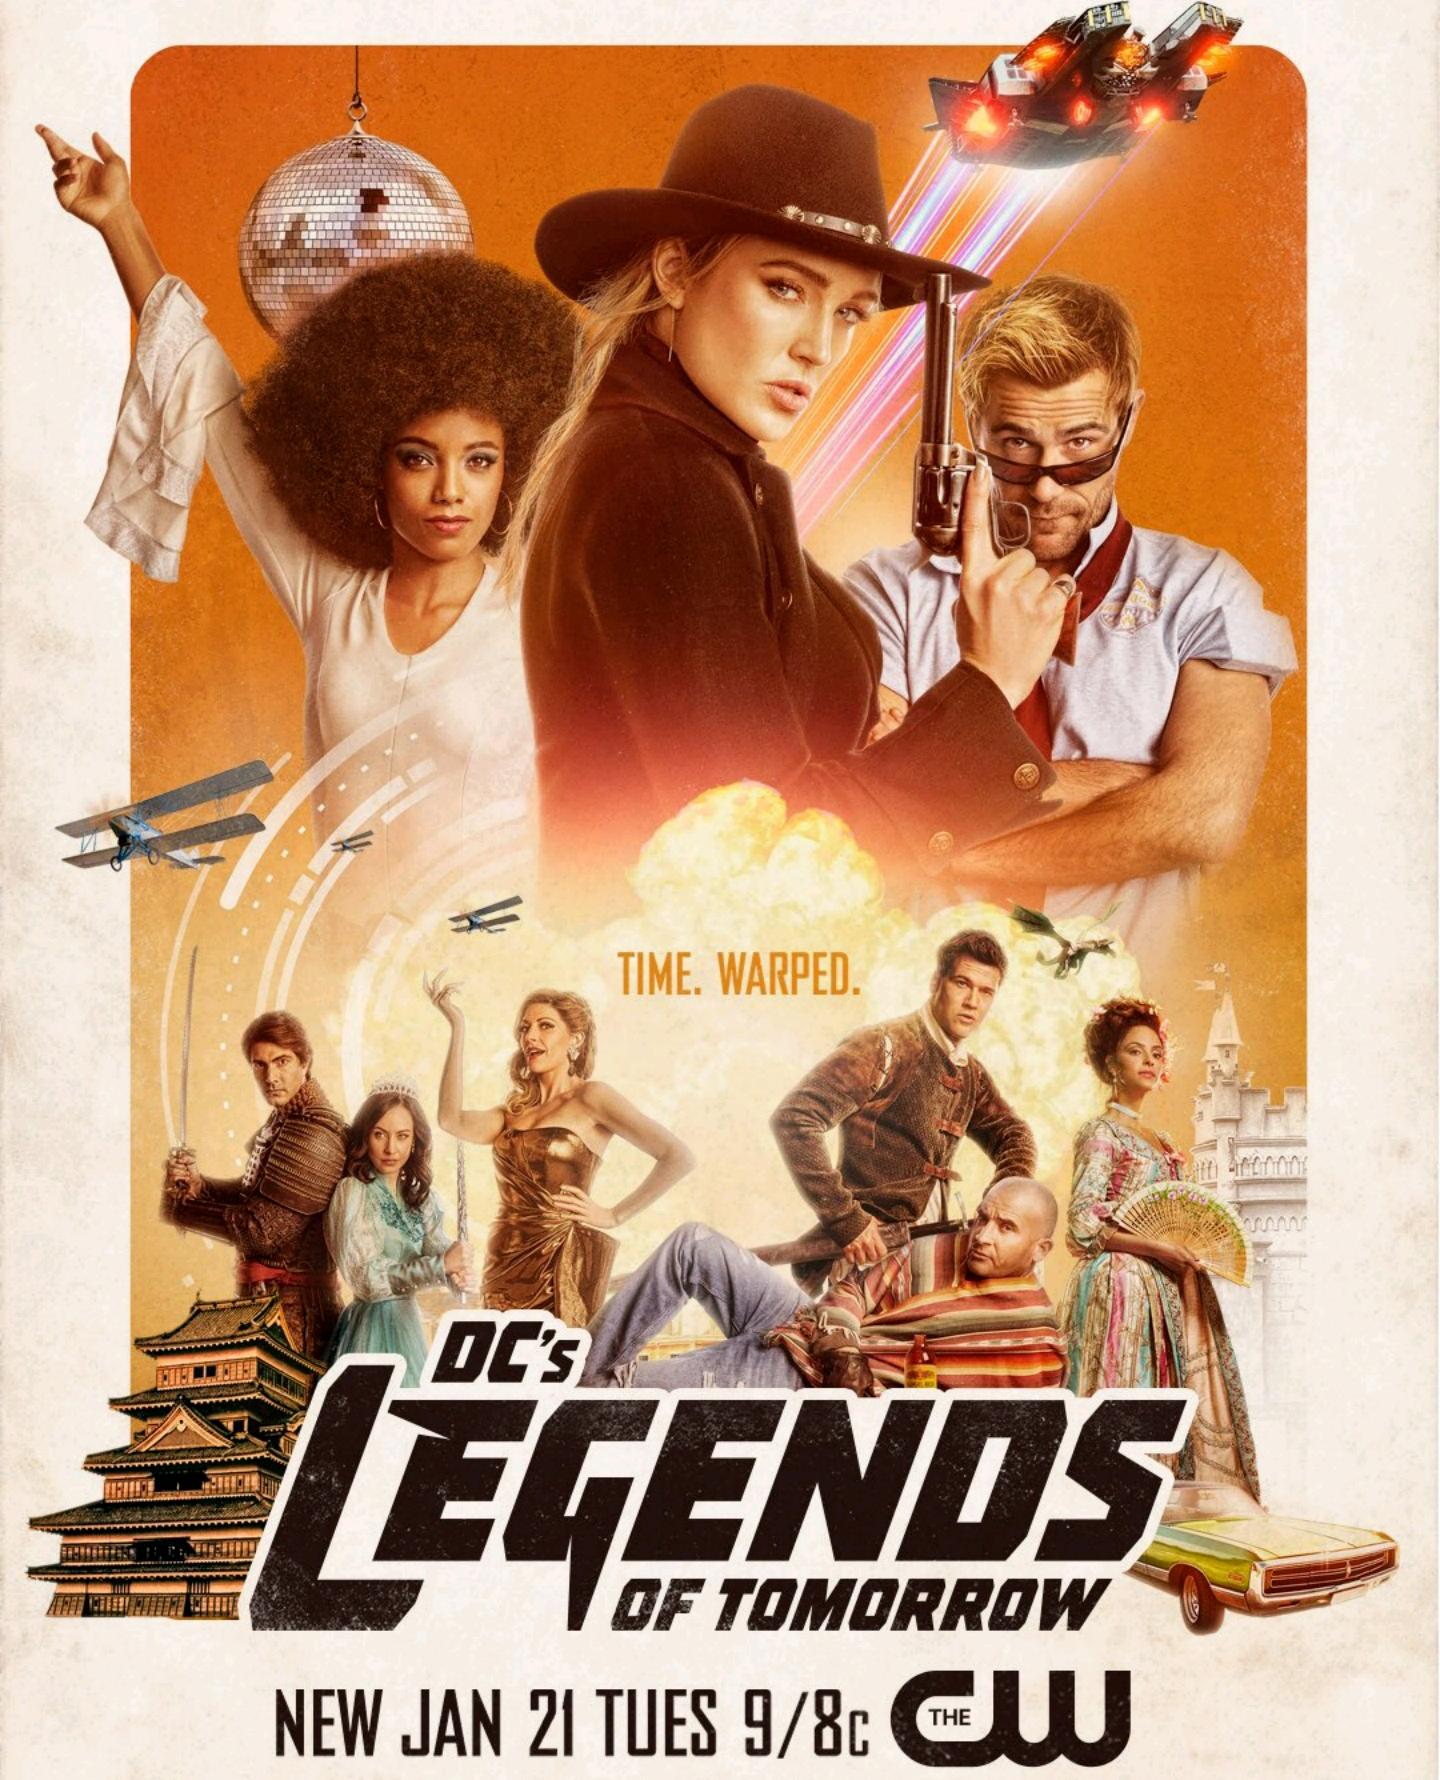 Season 5 (DC's Legends of Tomorrow)